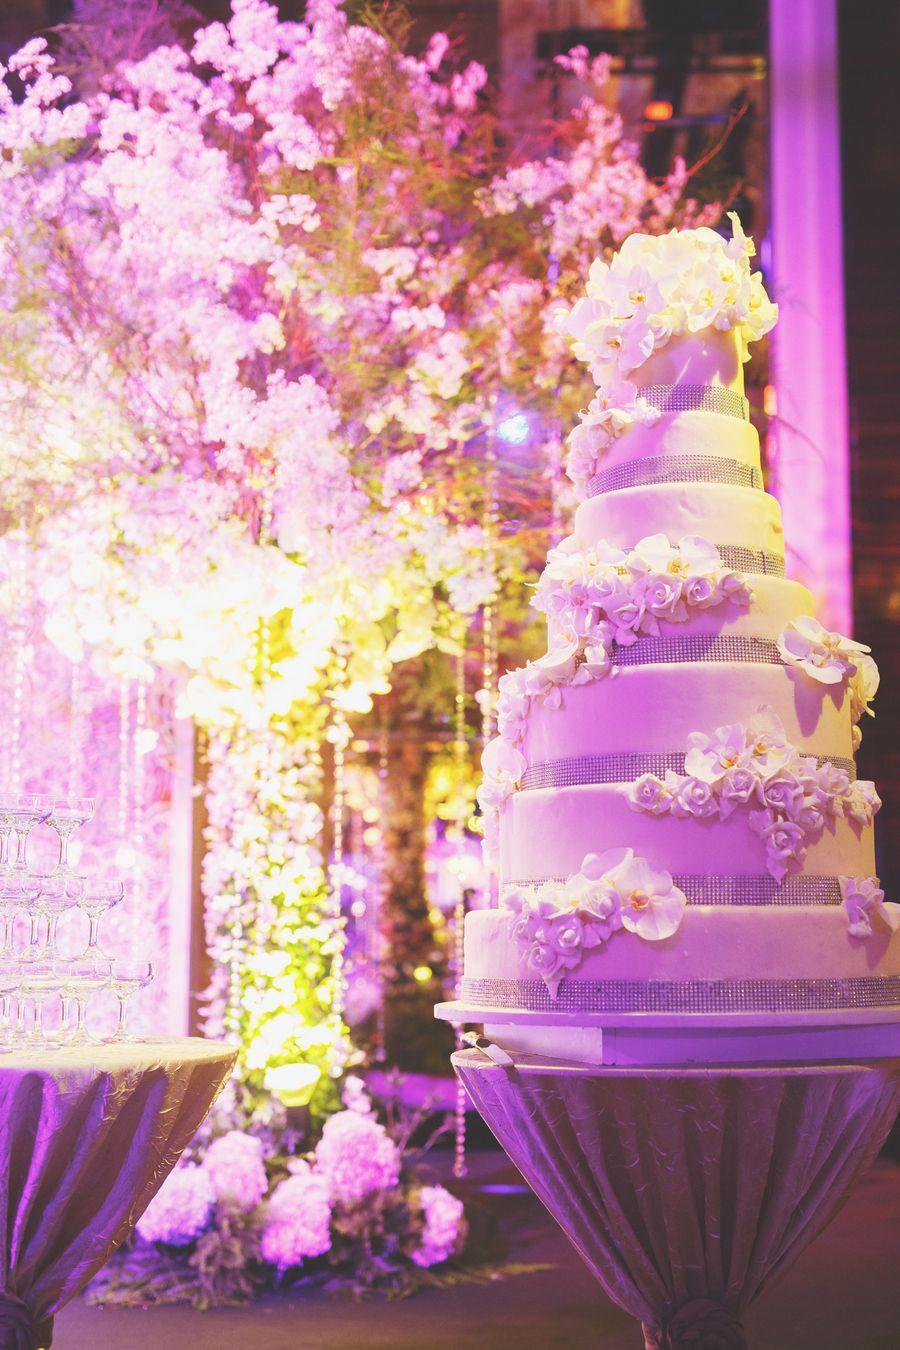 St. Regis Wedding Bathed in Purple Light: Ben and Amanda | Cakes ...